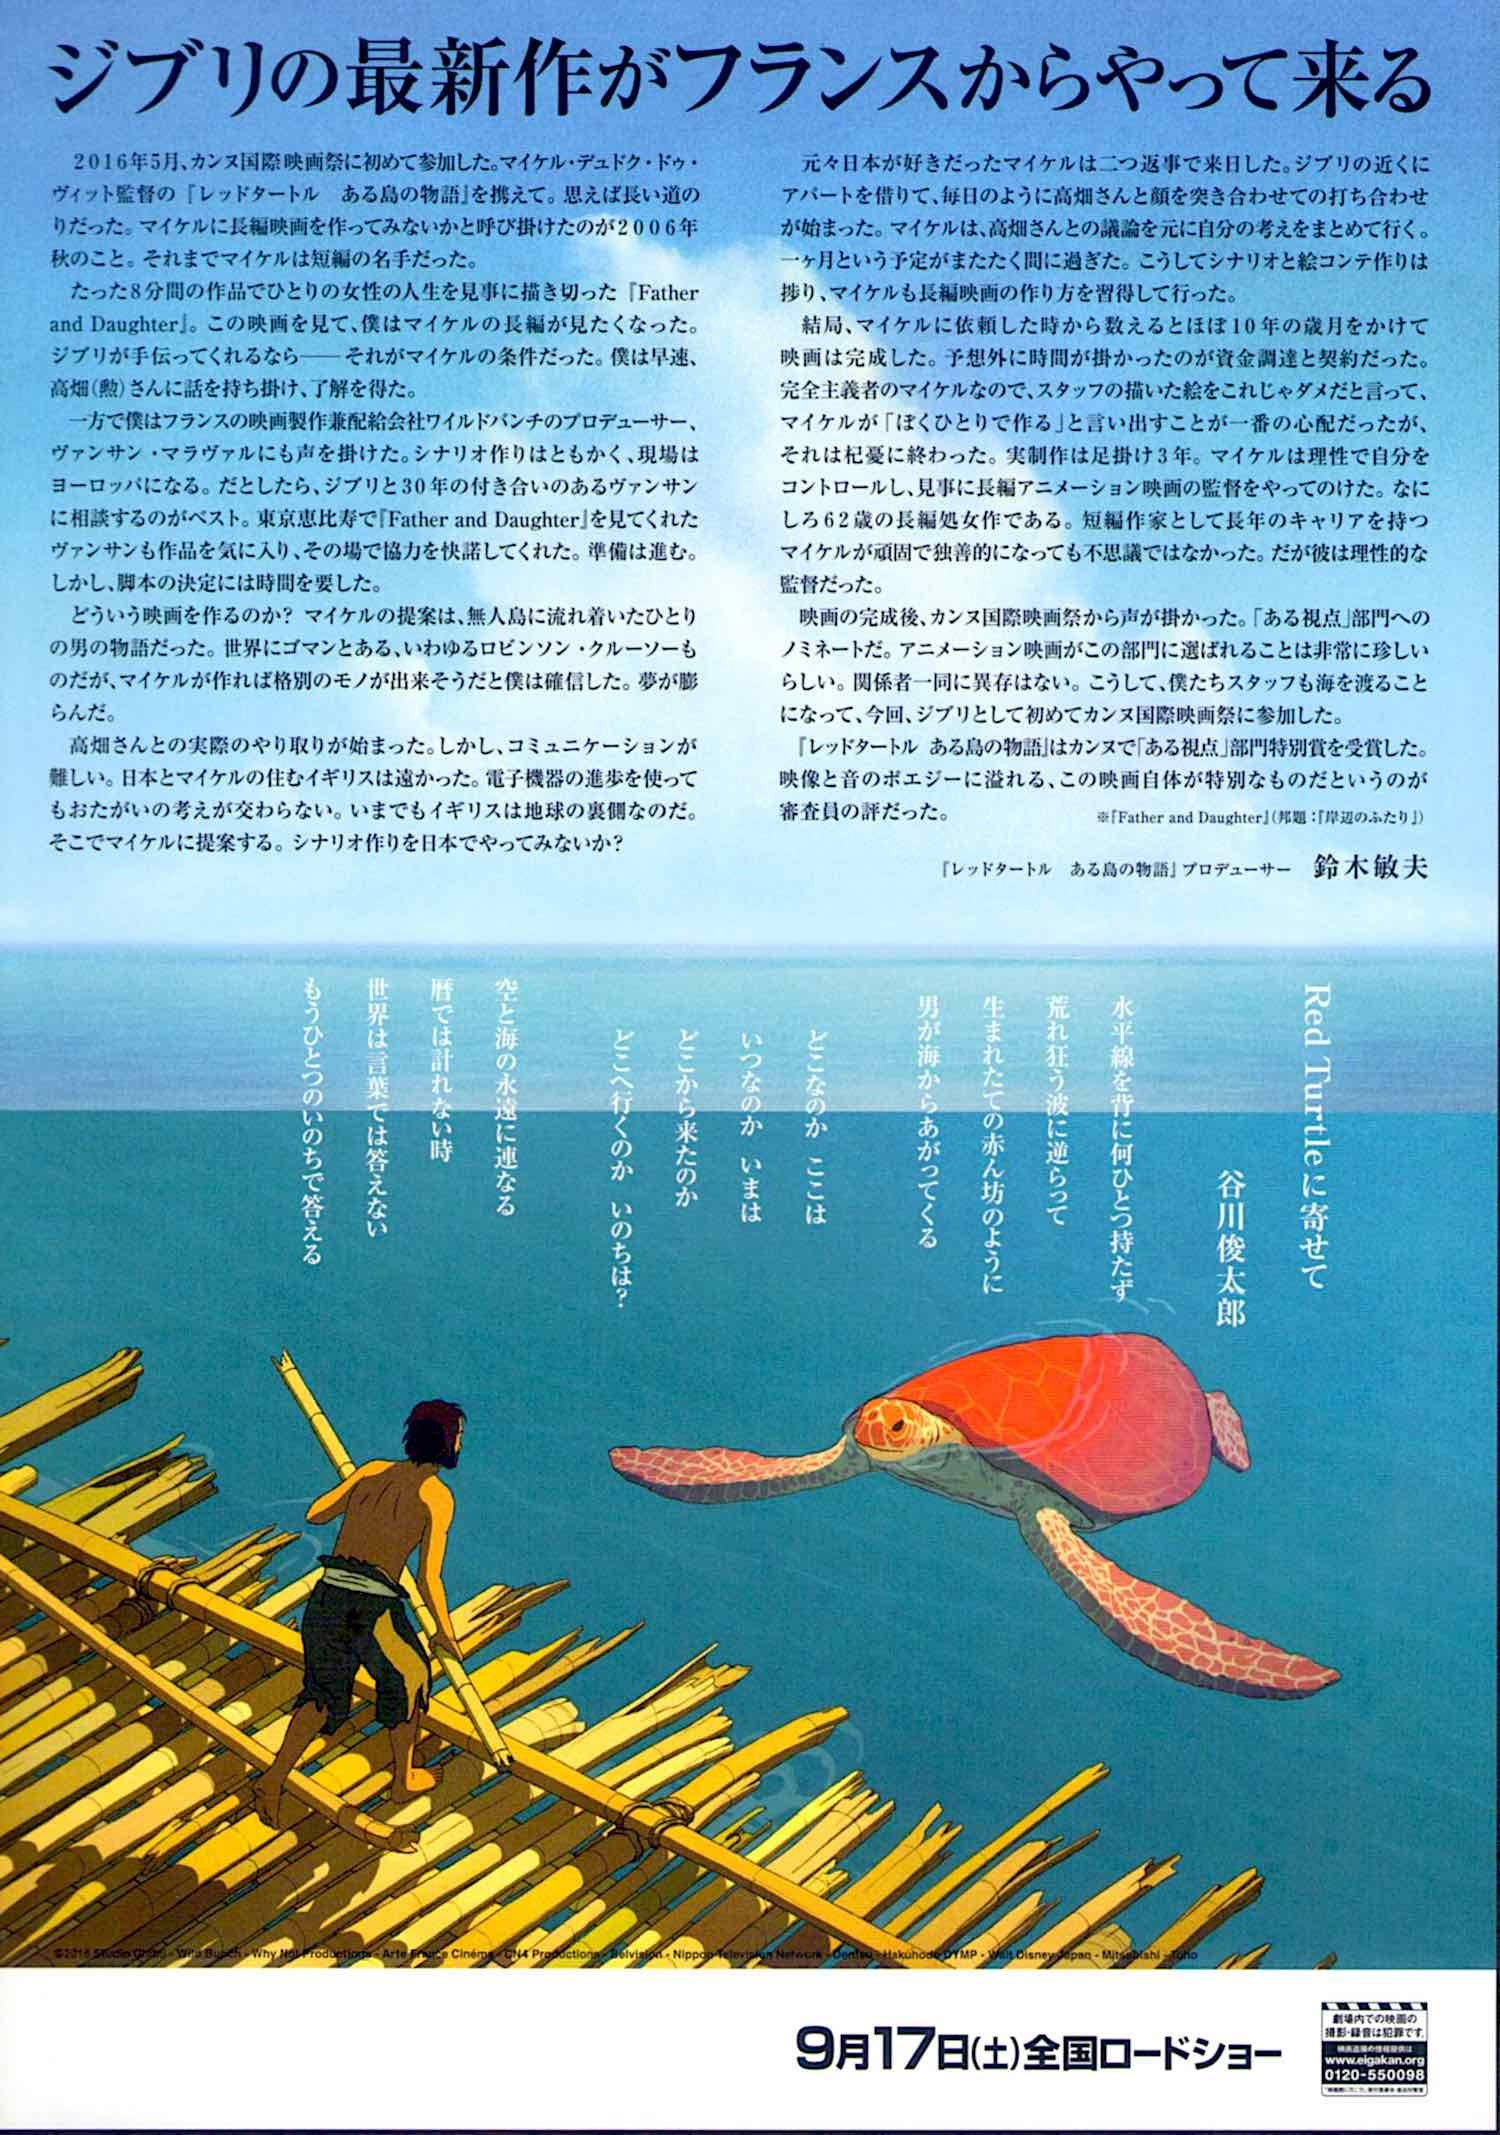 Red Turtle Studio Ghibli Animation Michael Dudok De Wit 2016 Original Print Japanese Chirashi Film Poster